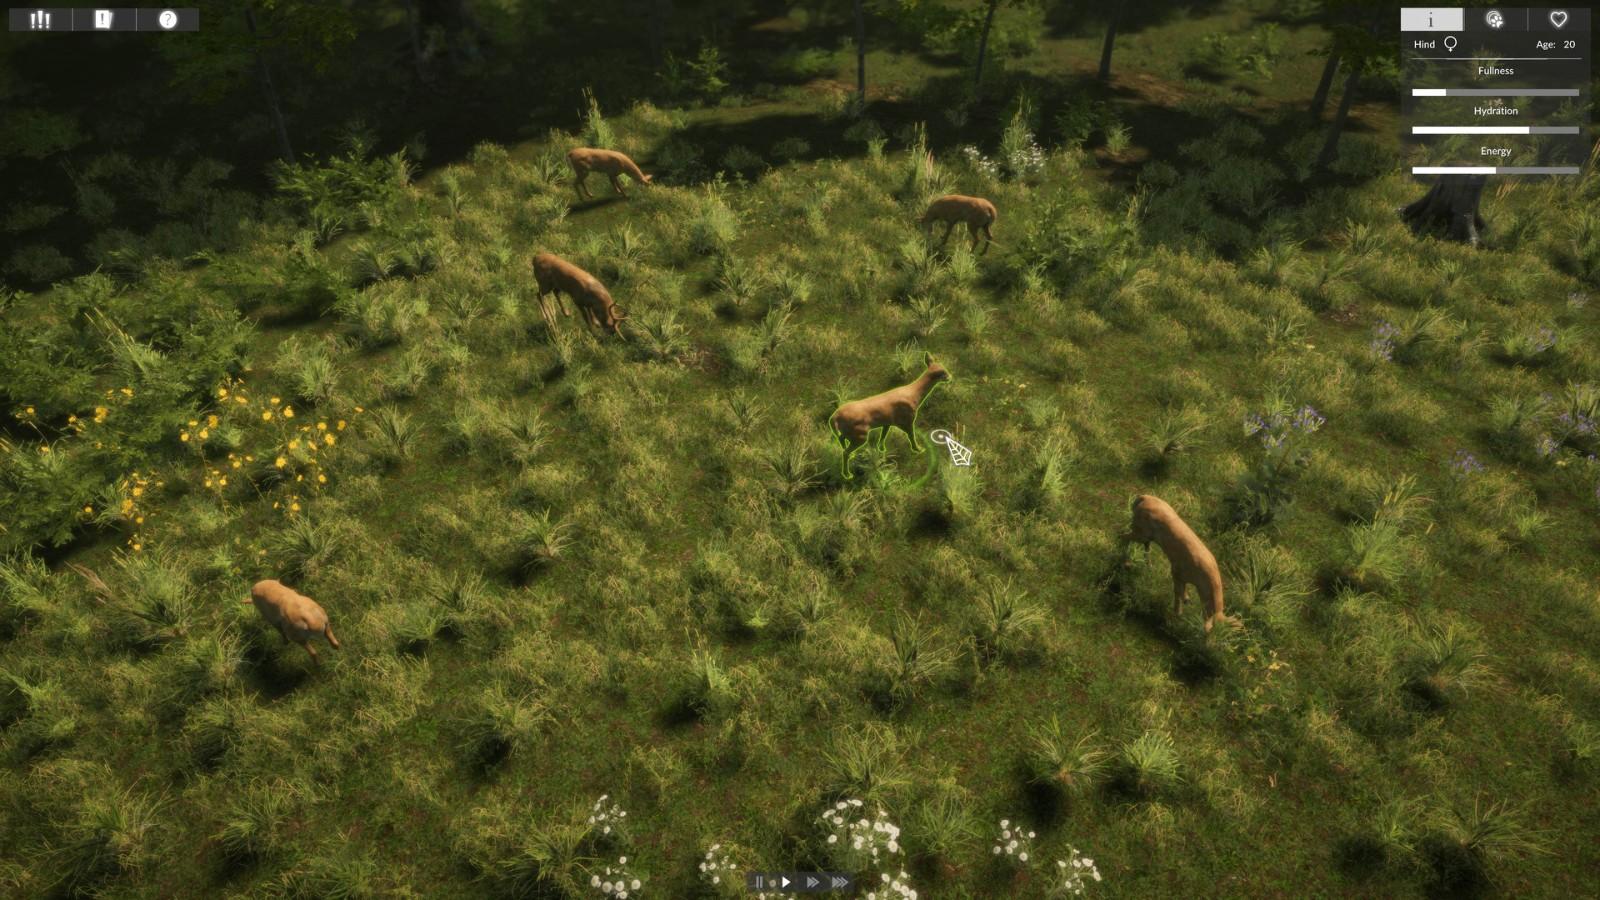 Steam新作《自然本能》 透过游戏体验保护野生动物